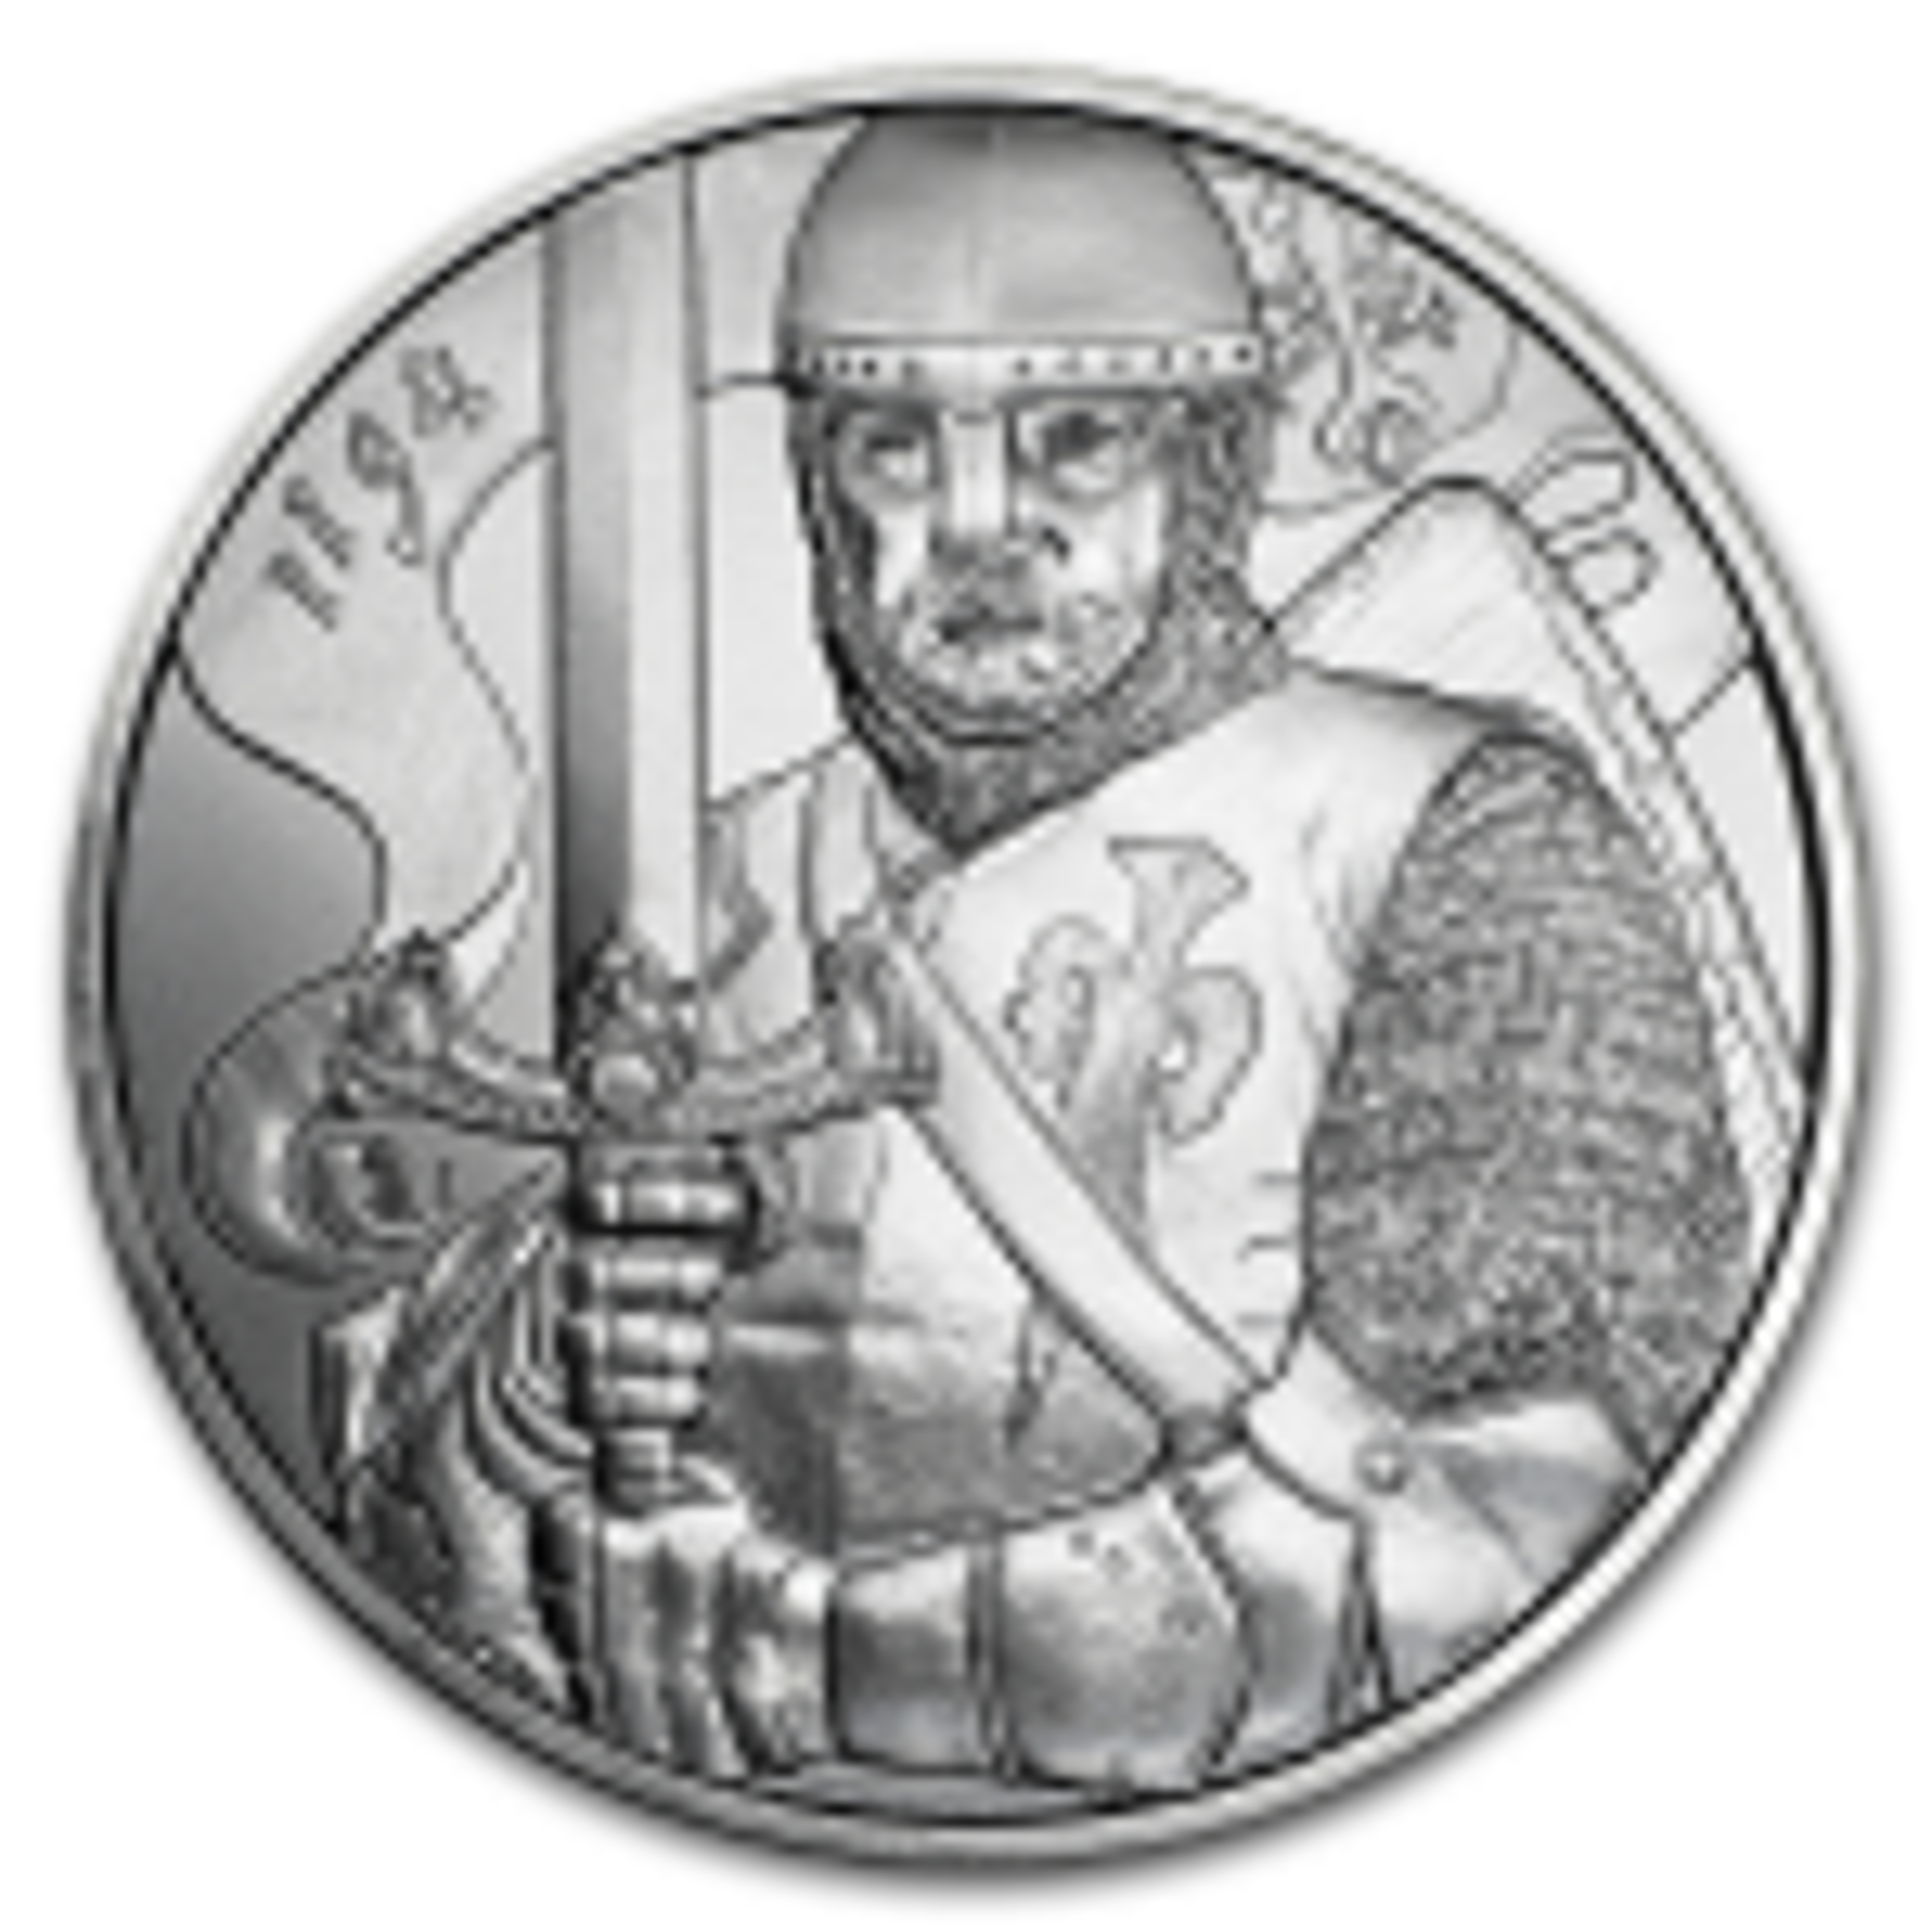 1 Troy ounce silver coin Austria Hertog Leopold V 2019